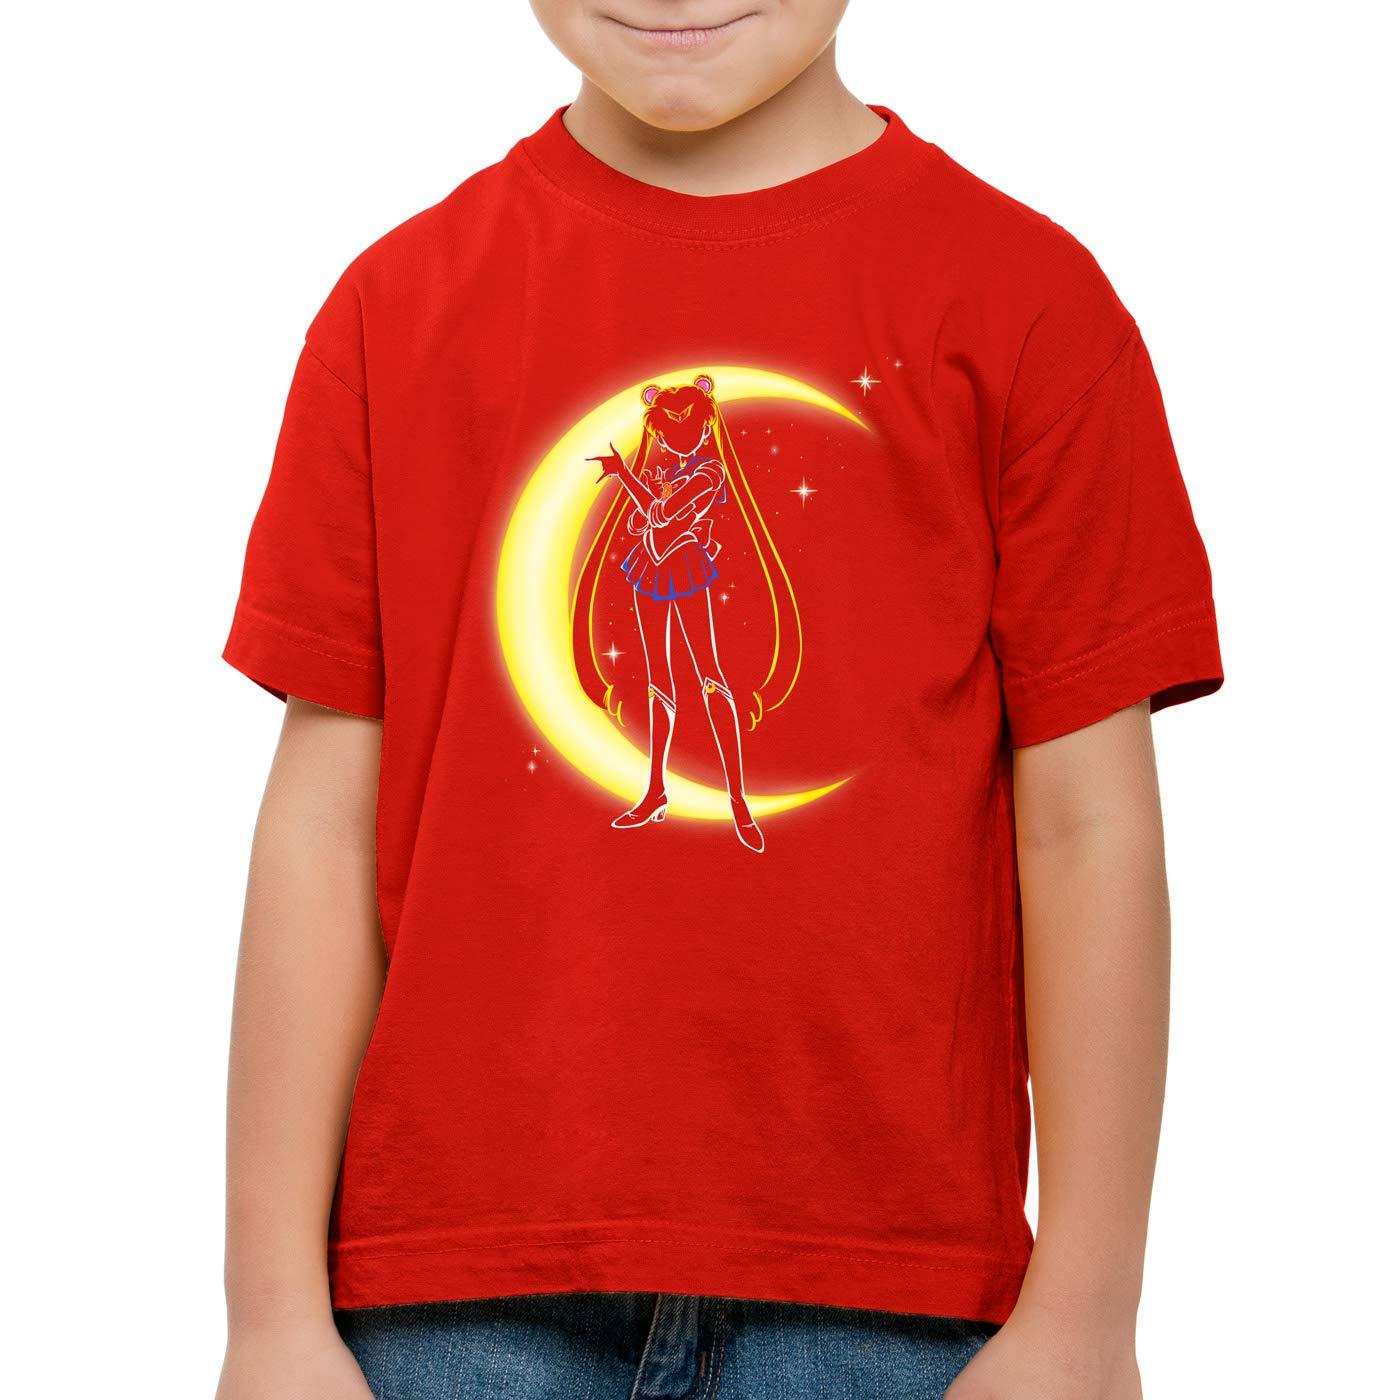 style3 Mondzauber T-Shirt f/ür Kinder Sailor mondstein Moon Luna Bunny Mars Anime